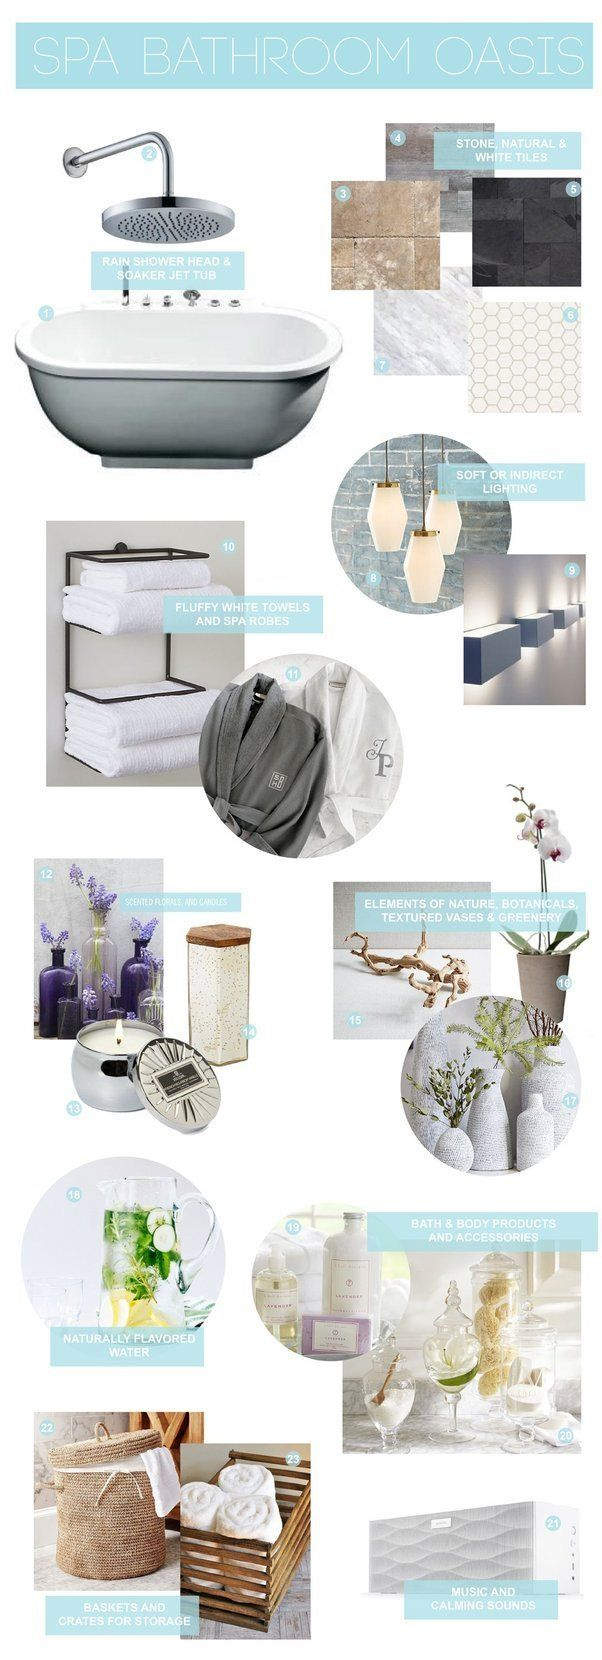 Home Spa Design Ideas: Create Your Own Spa Bathroom Oasis